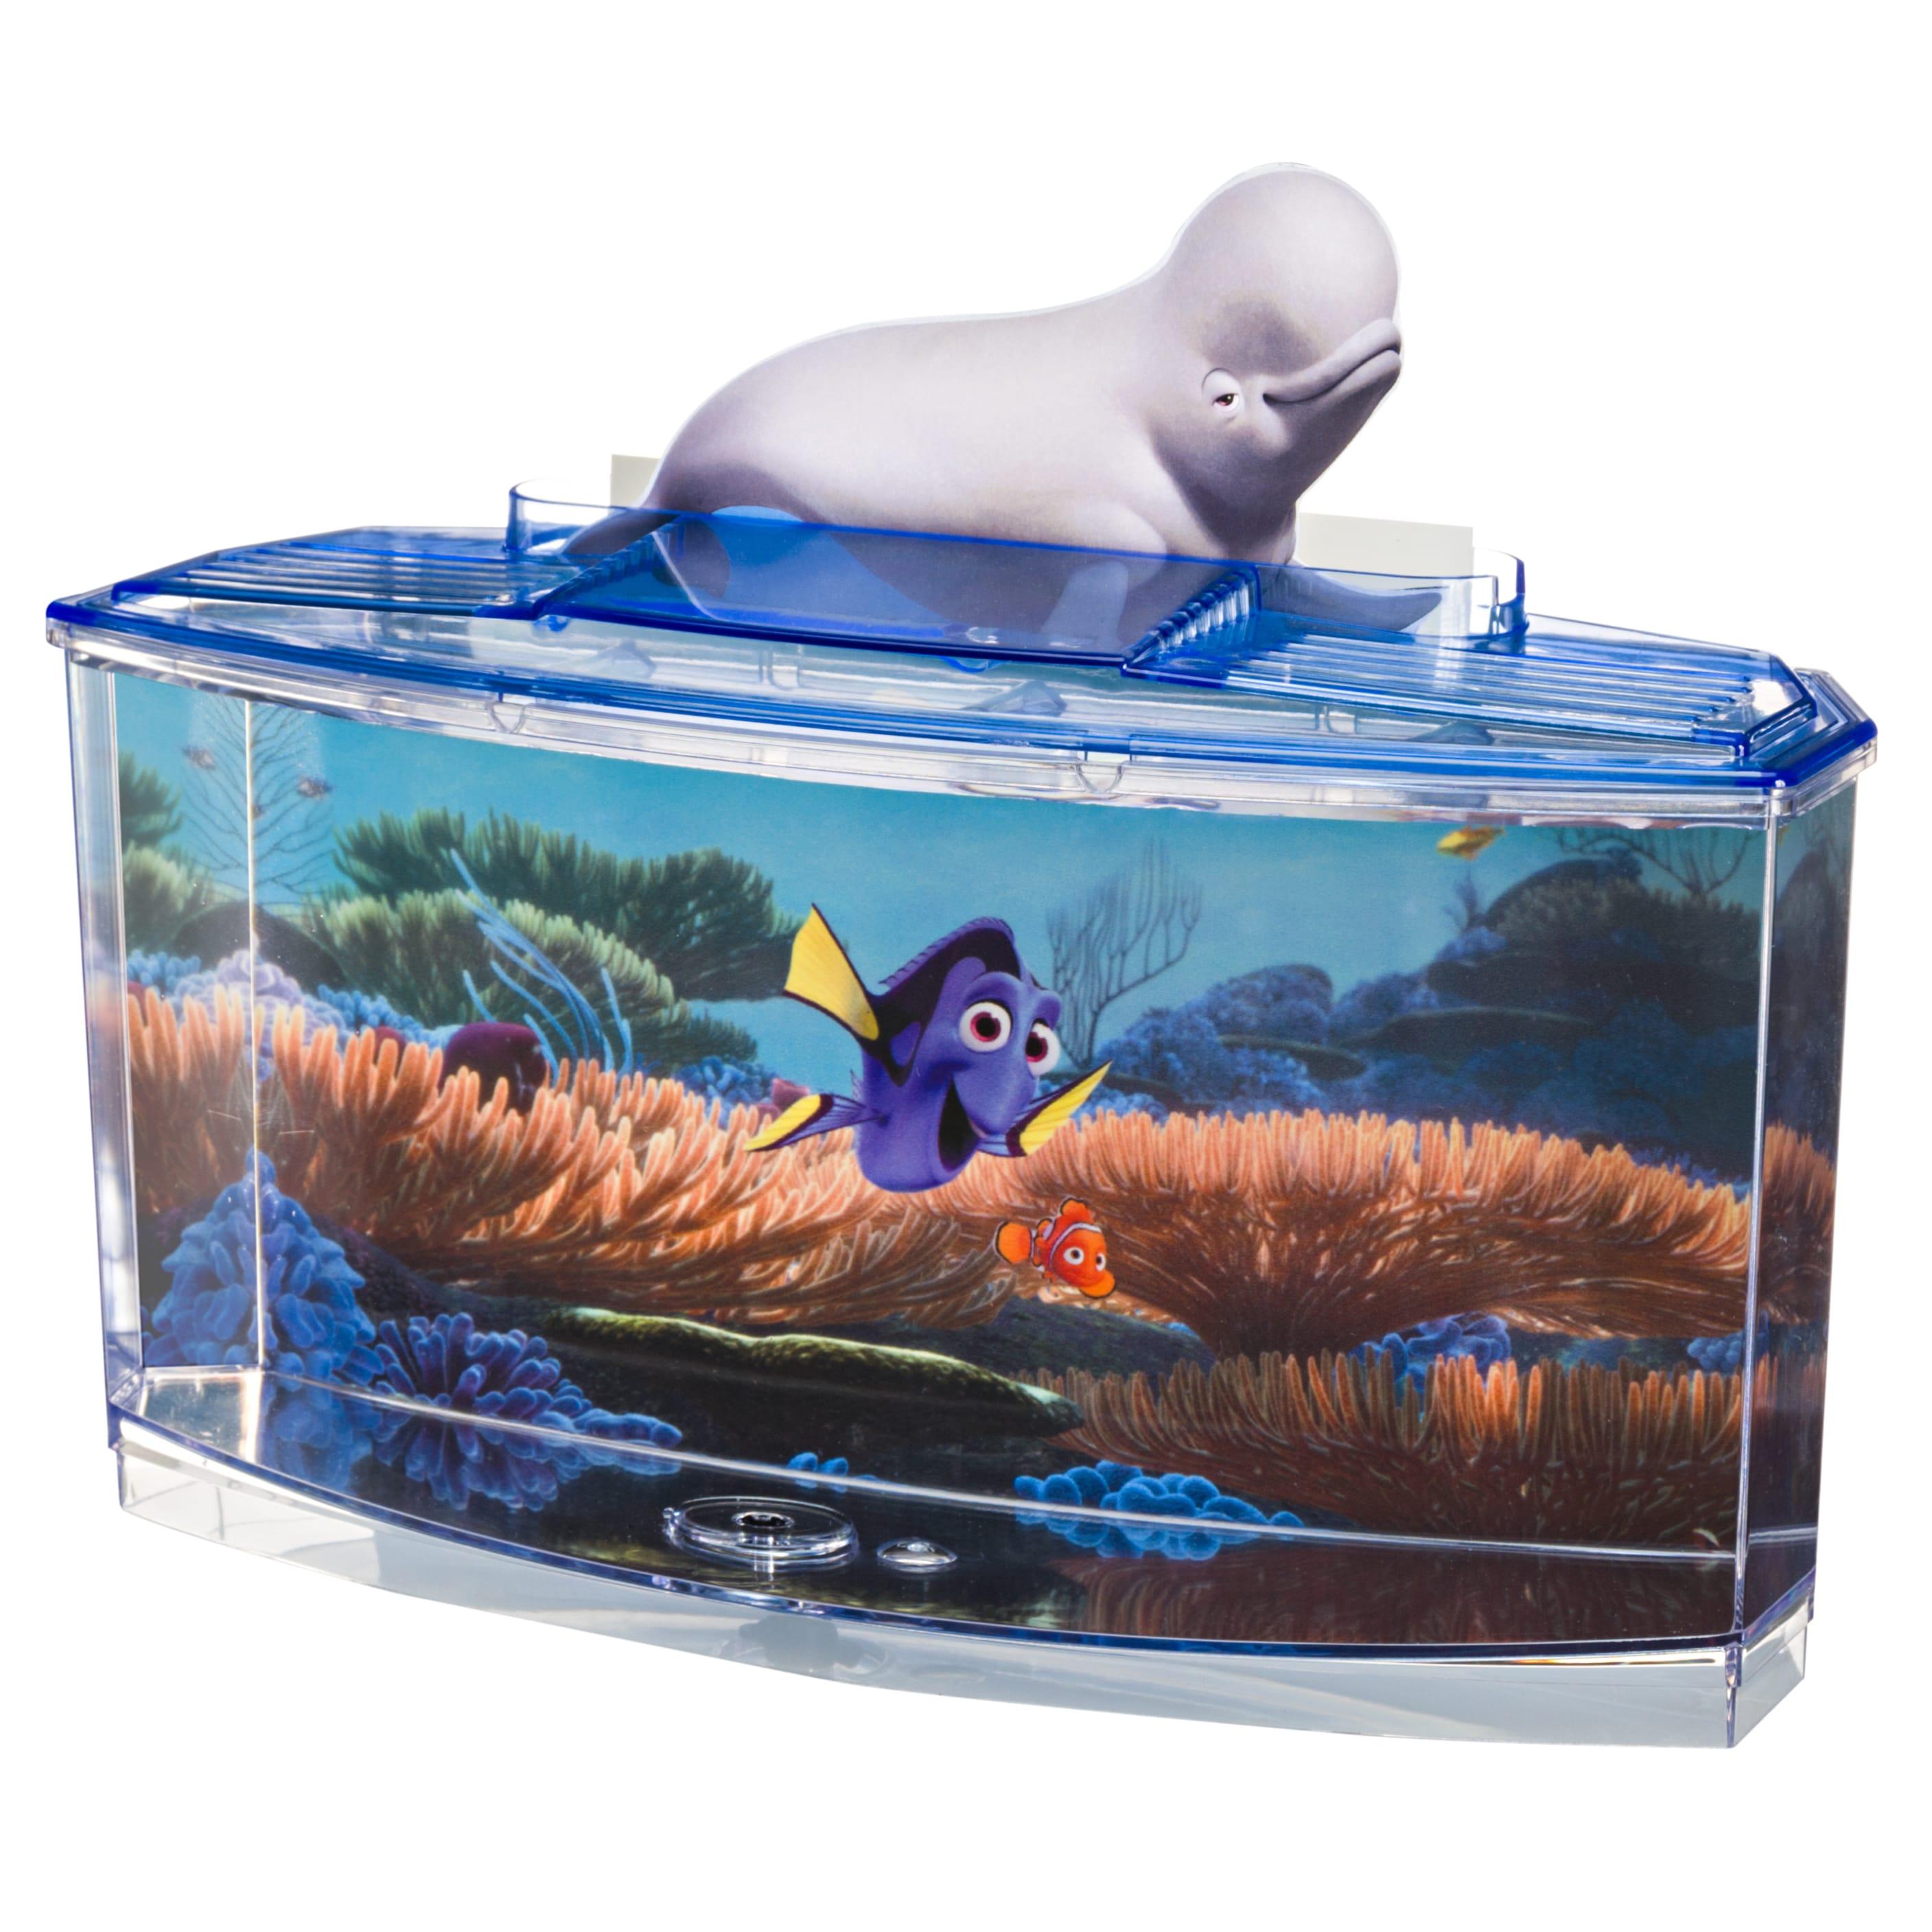 Penn Plax Disney Finding Dory Aquarium Betta Fish Tank Kit with 4